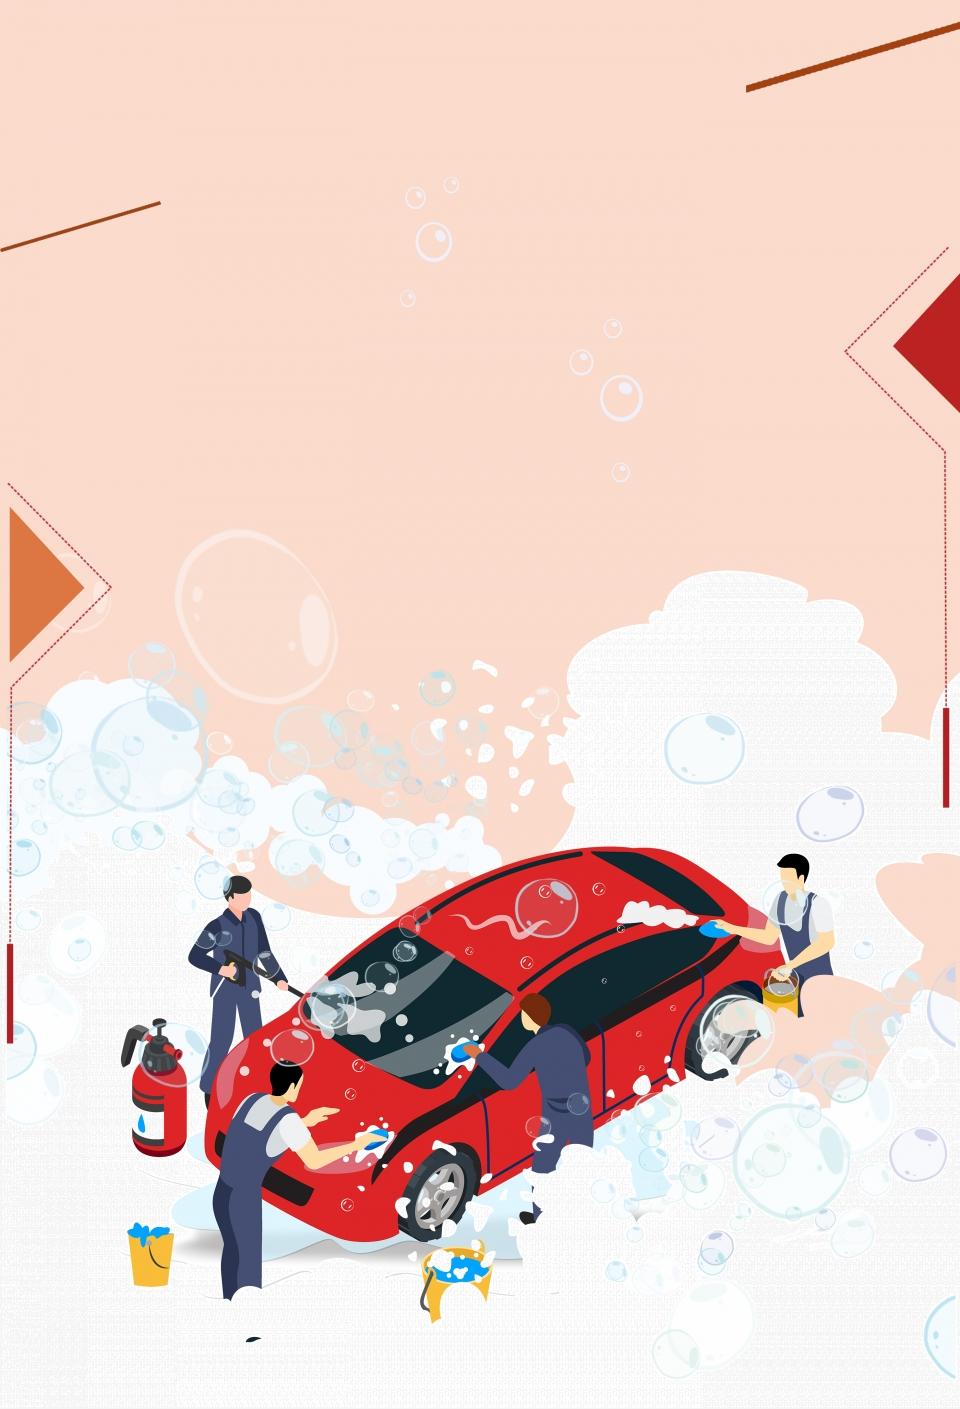 Creative Underwater World Car Wash Advertising Poster Background